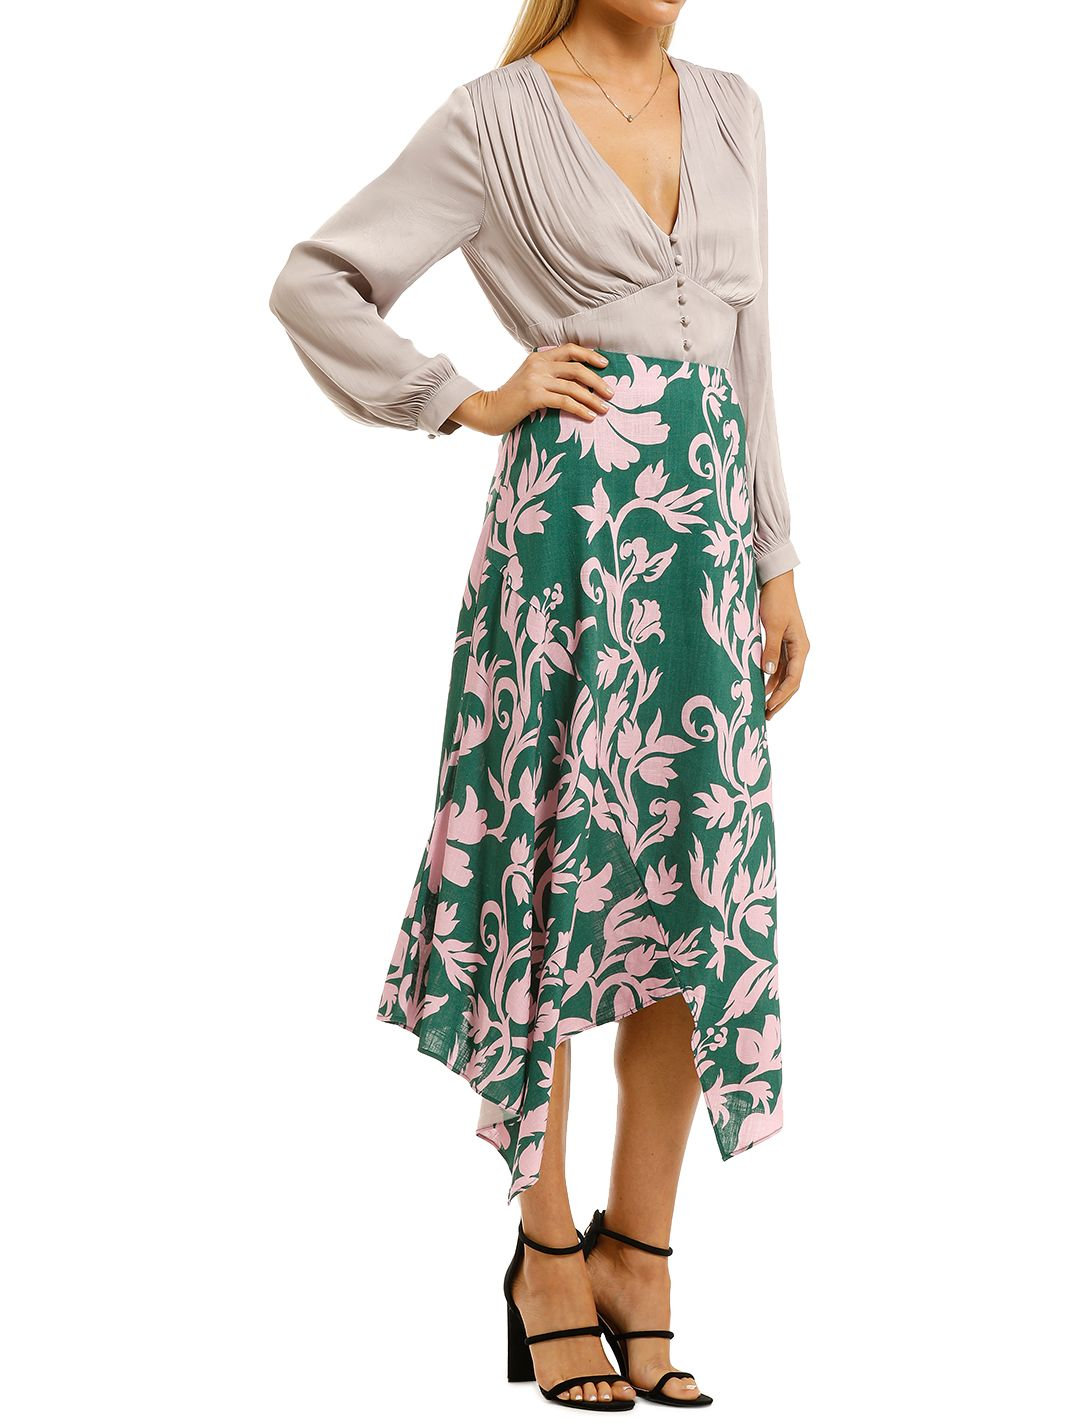 Keepsake-the-Label-Wistful-Skirt-Jade-Baroque-Side